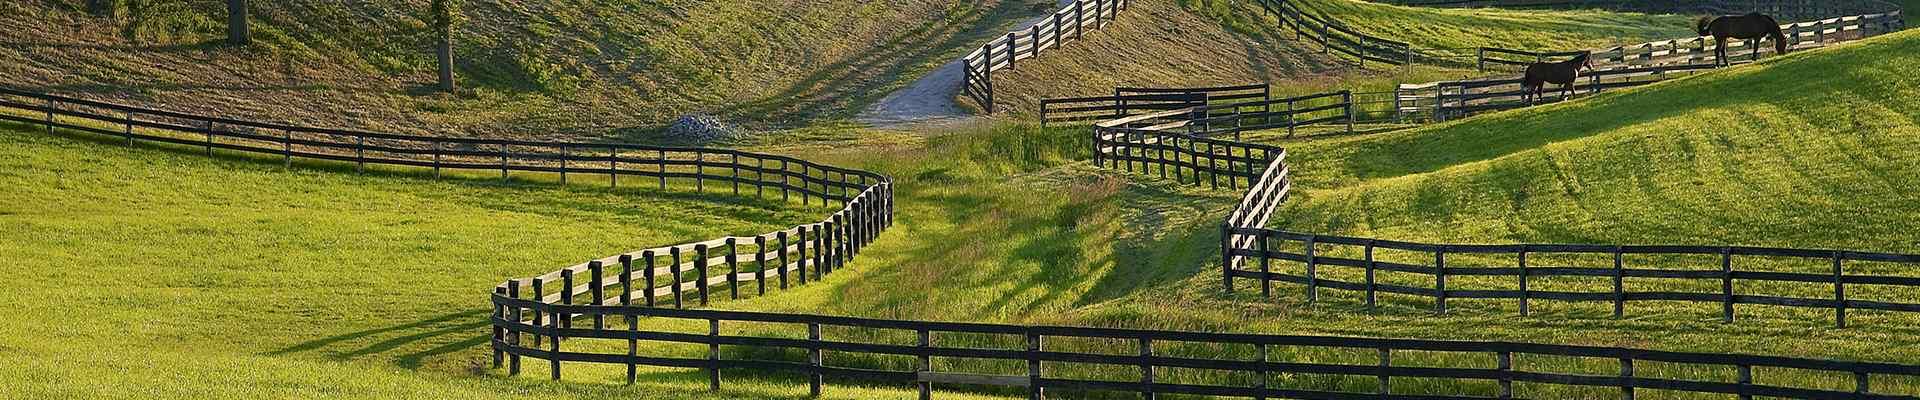 large fenced in pastures in van alstyne texas